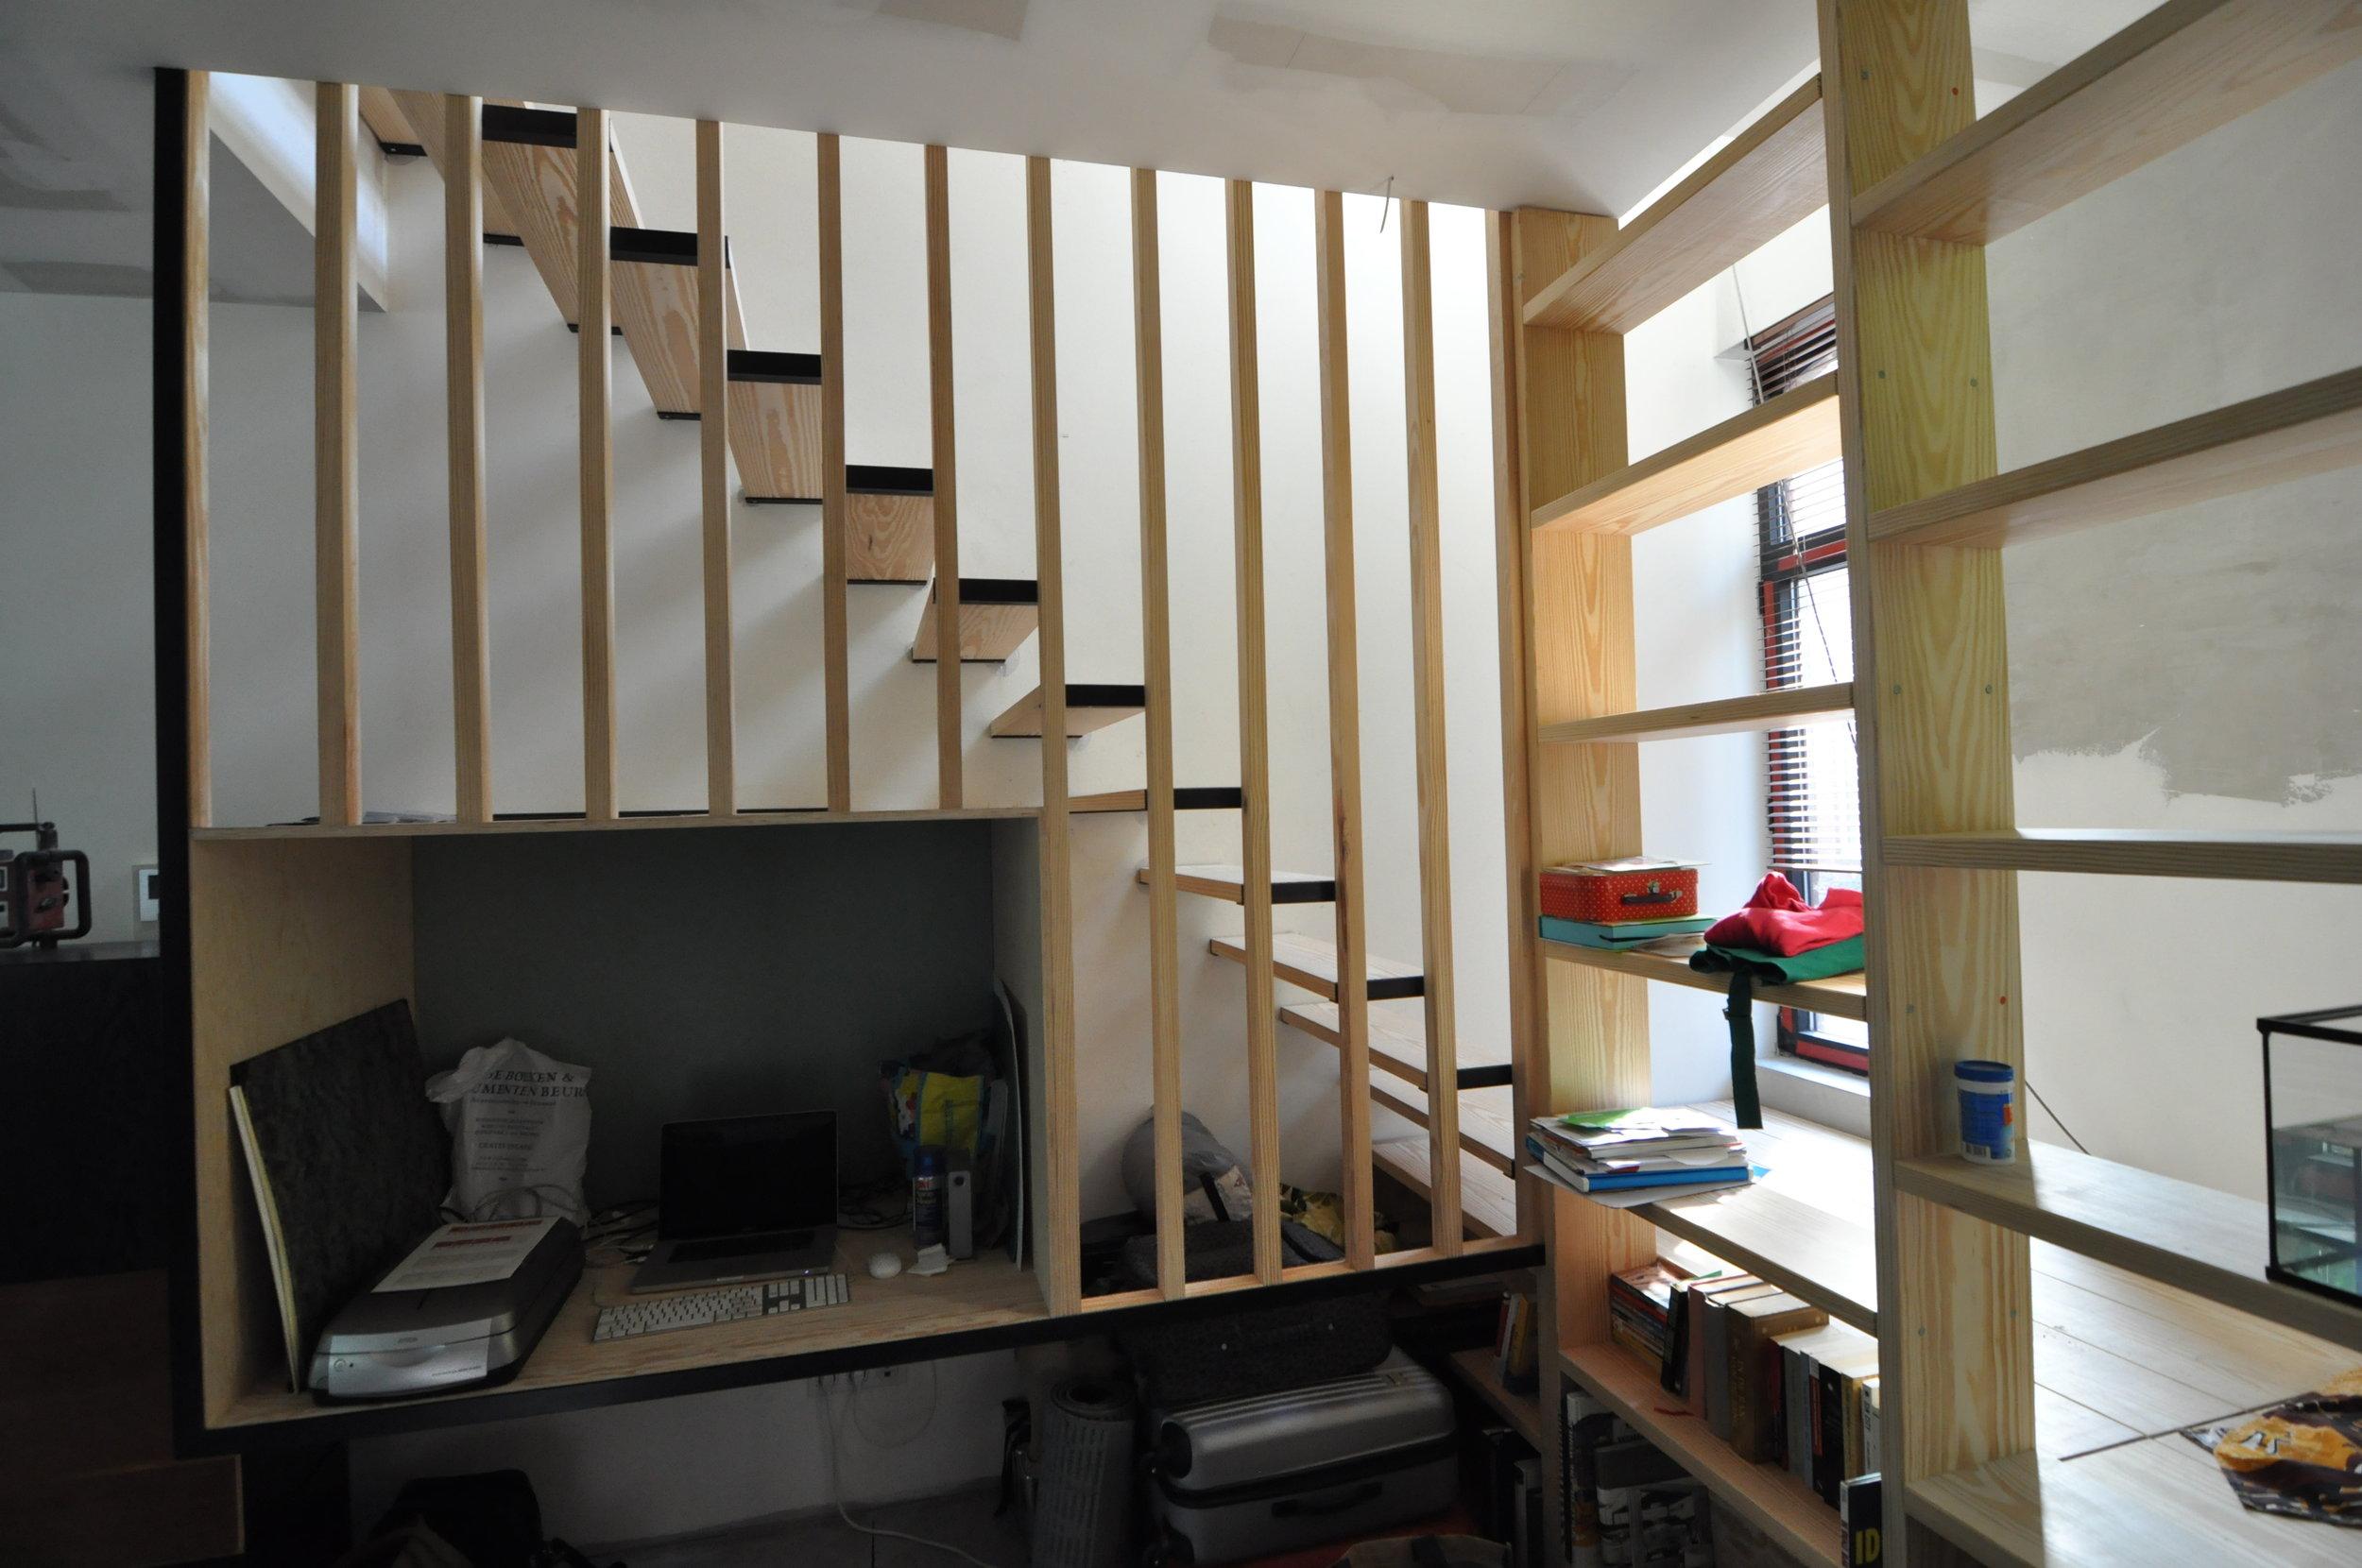 Keuken Met Trap : Interieurproject met trap bureau keuken en boekenkast u2014 stulp